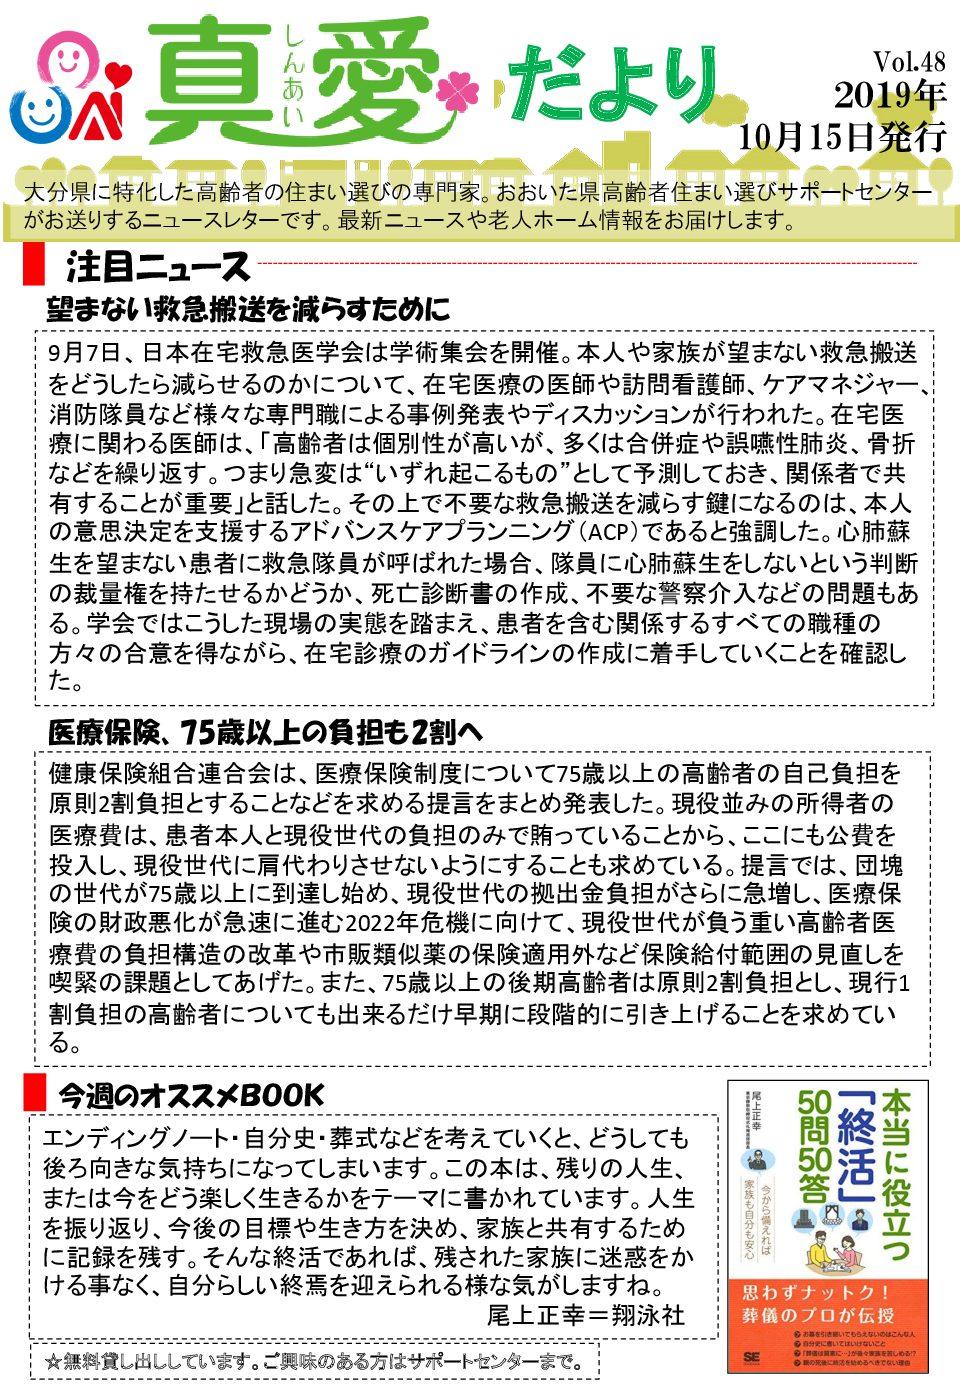 【Vol.48】 2019.10.15発行